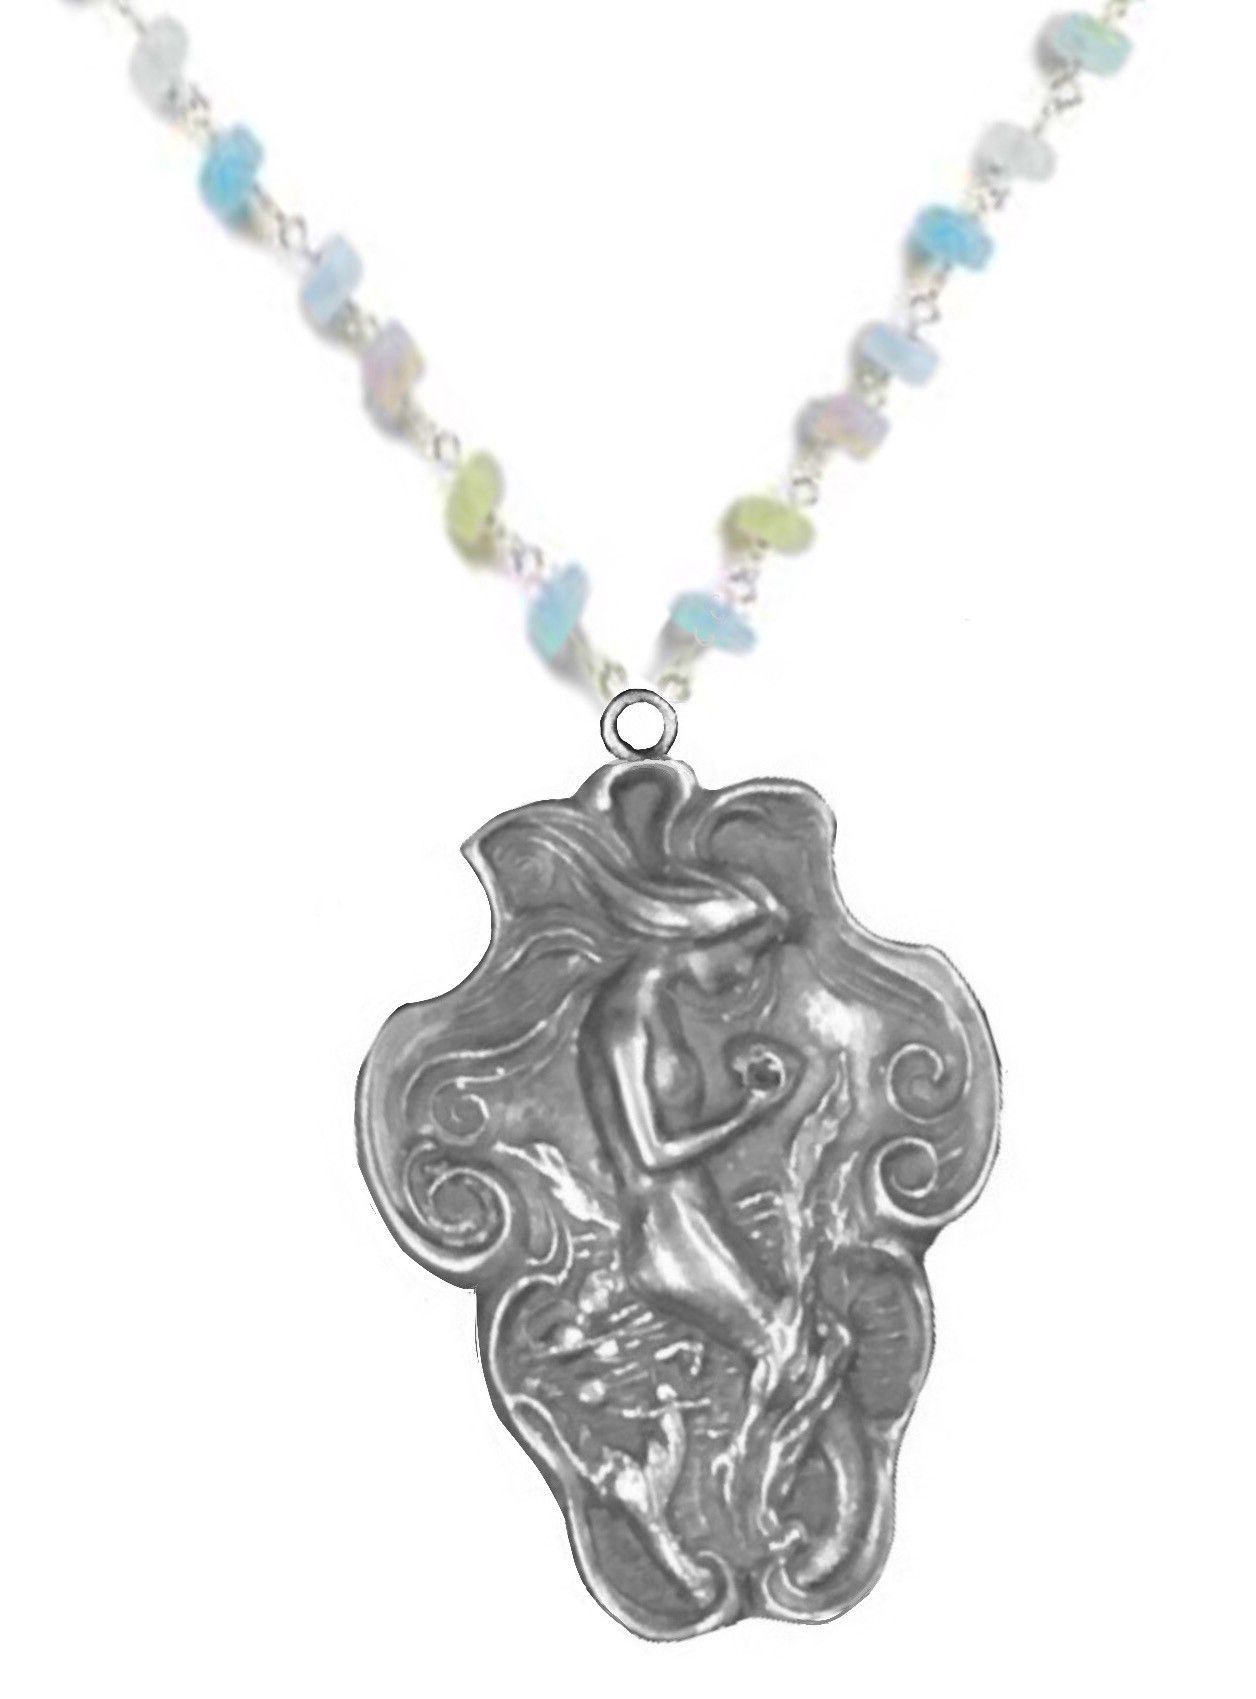 Beautiful Art Nouveau mermaid pendant necklace